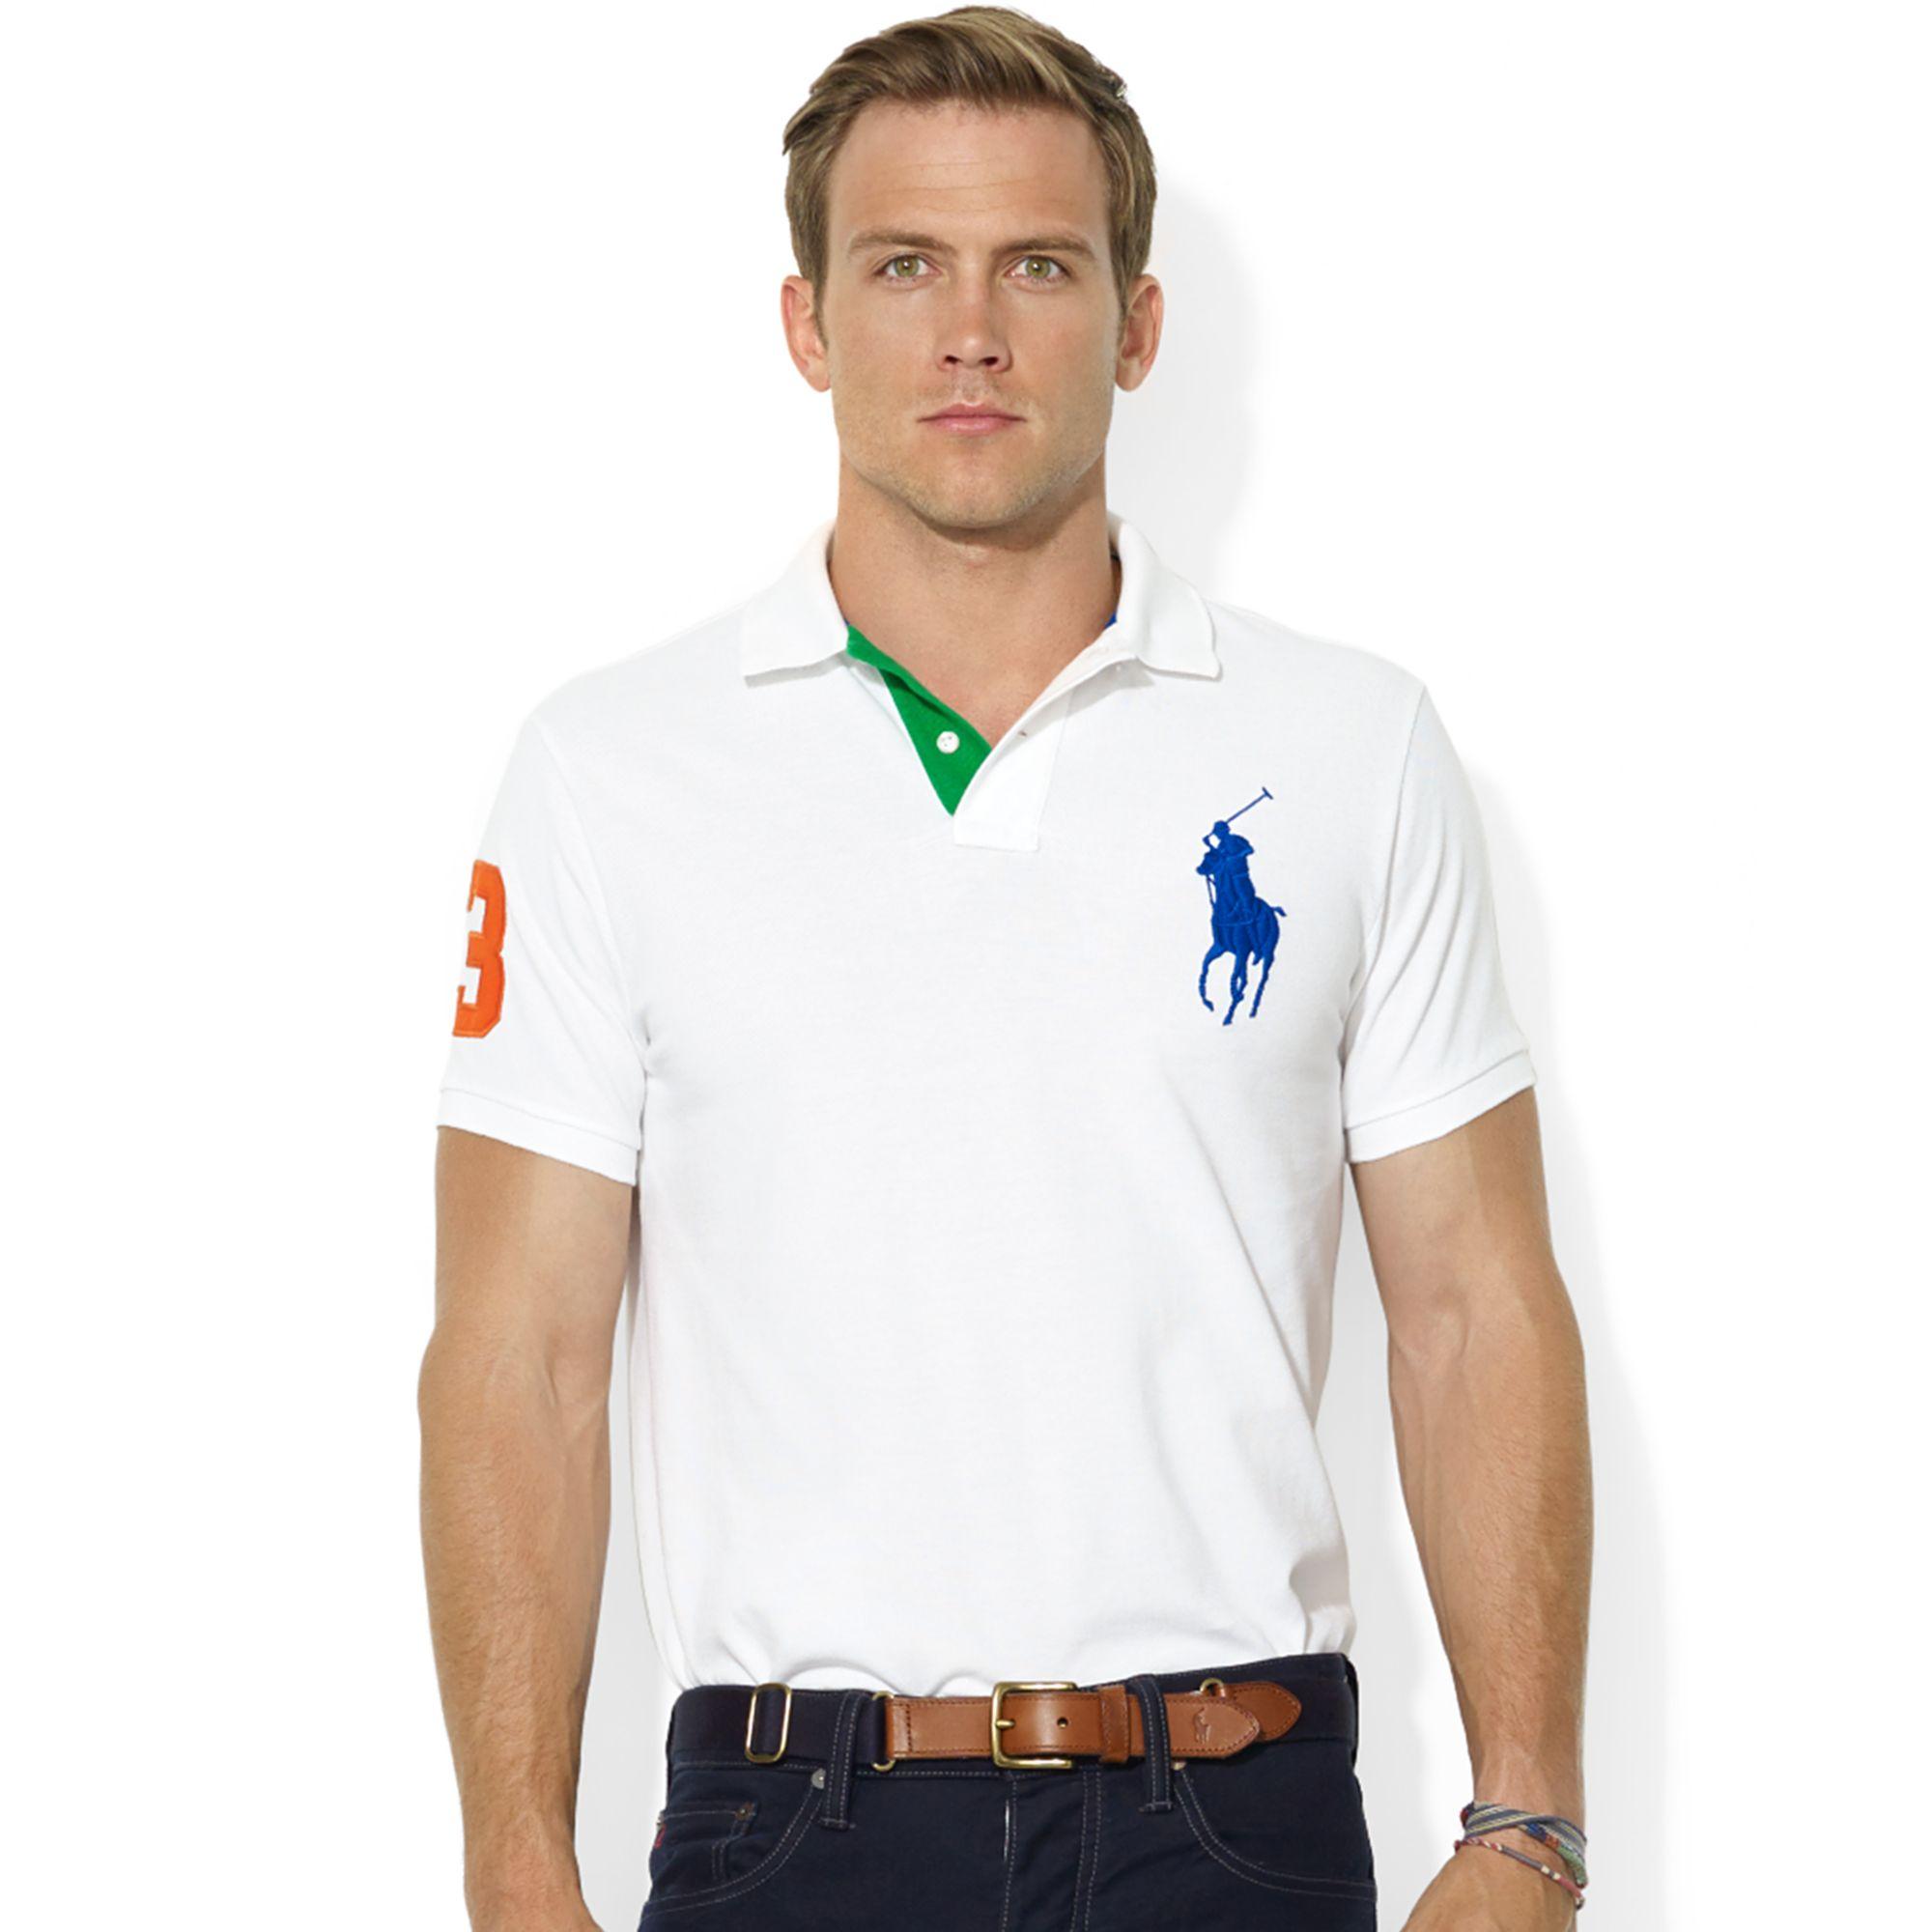 a255738c12f1 Ralph Lauren Customfit Big Pony Mesh Polo in White for Men - Lyst